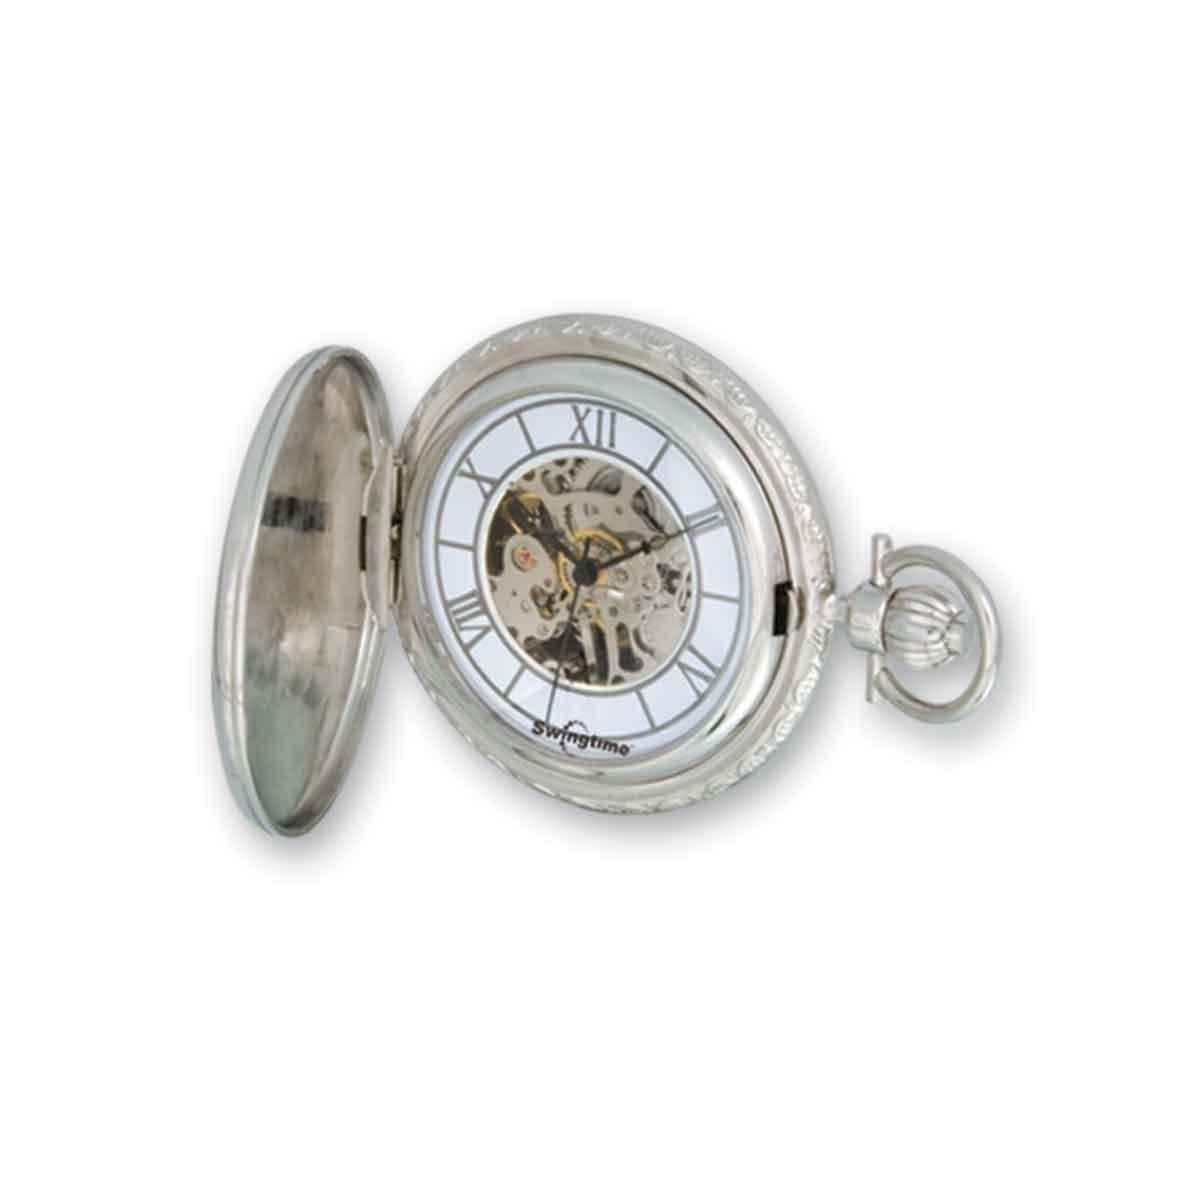 1e8b0129f Shop Versil Swingtime Rose and Chrome-finish Mechanical Pocket Watch - Free  Shipping Today - Overstock.com - 13950538